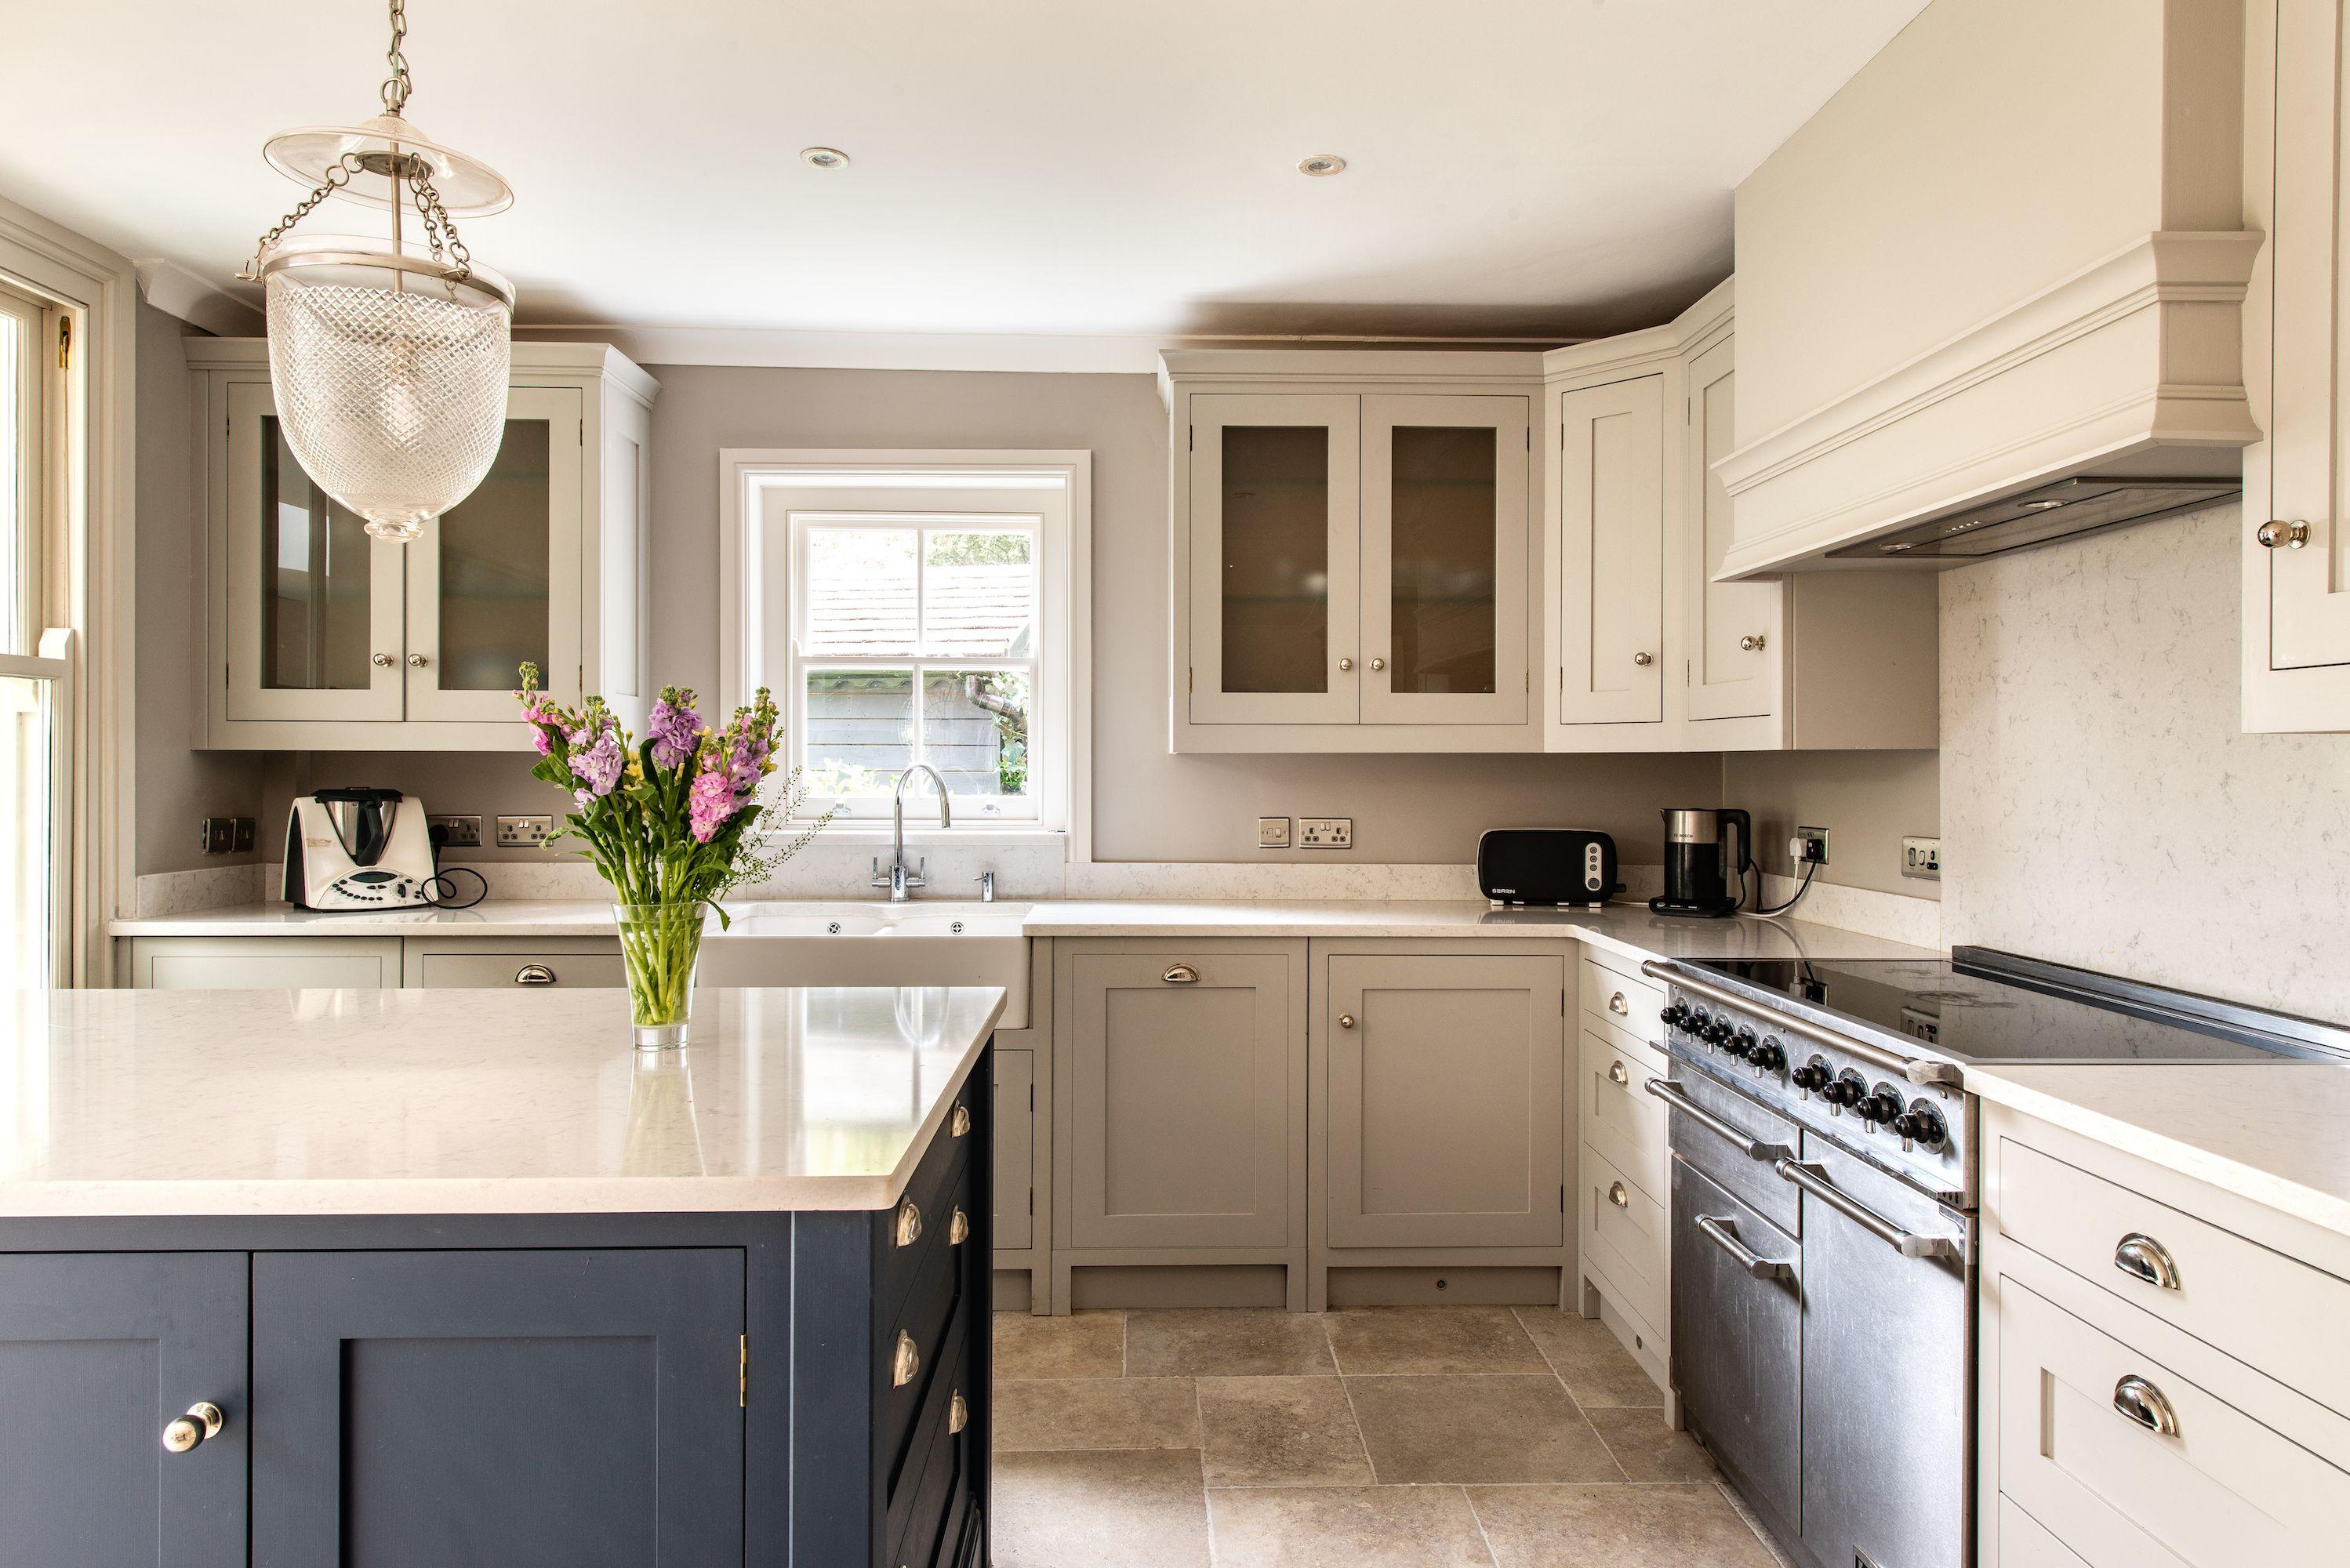 Herringbone Kitchens Bespoke Kitchens Made In Kent Armac Martin Silestone Classic Kitchens Bespoke Kitchens Kitchen